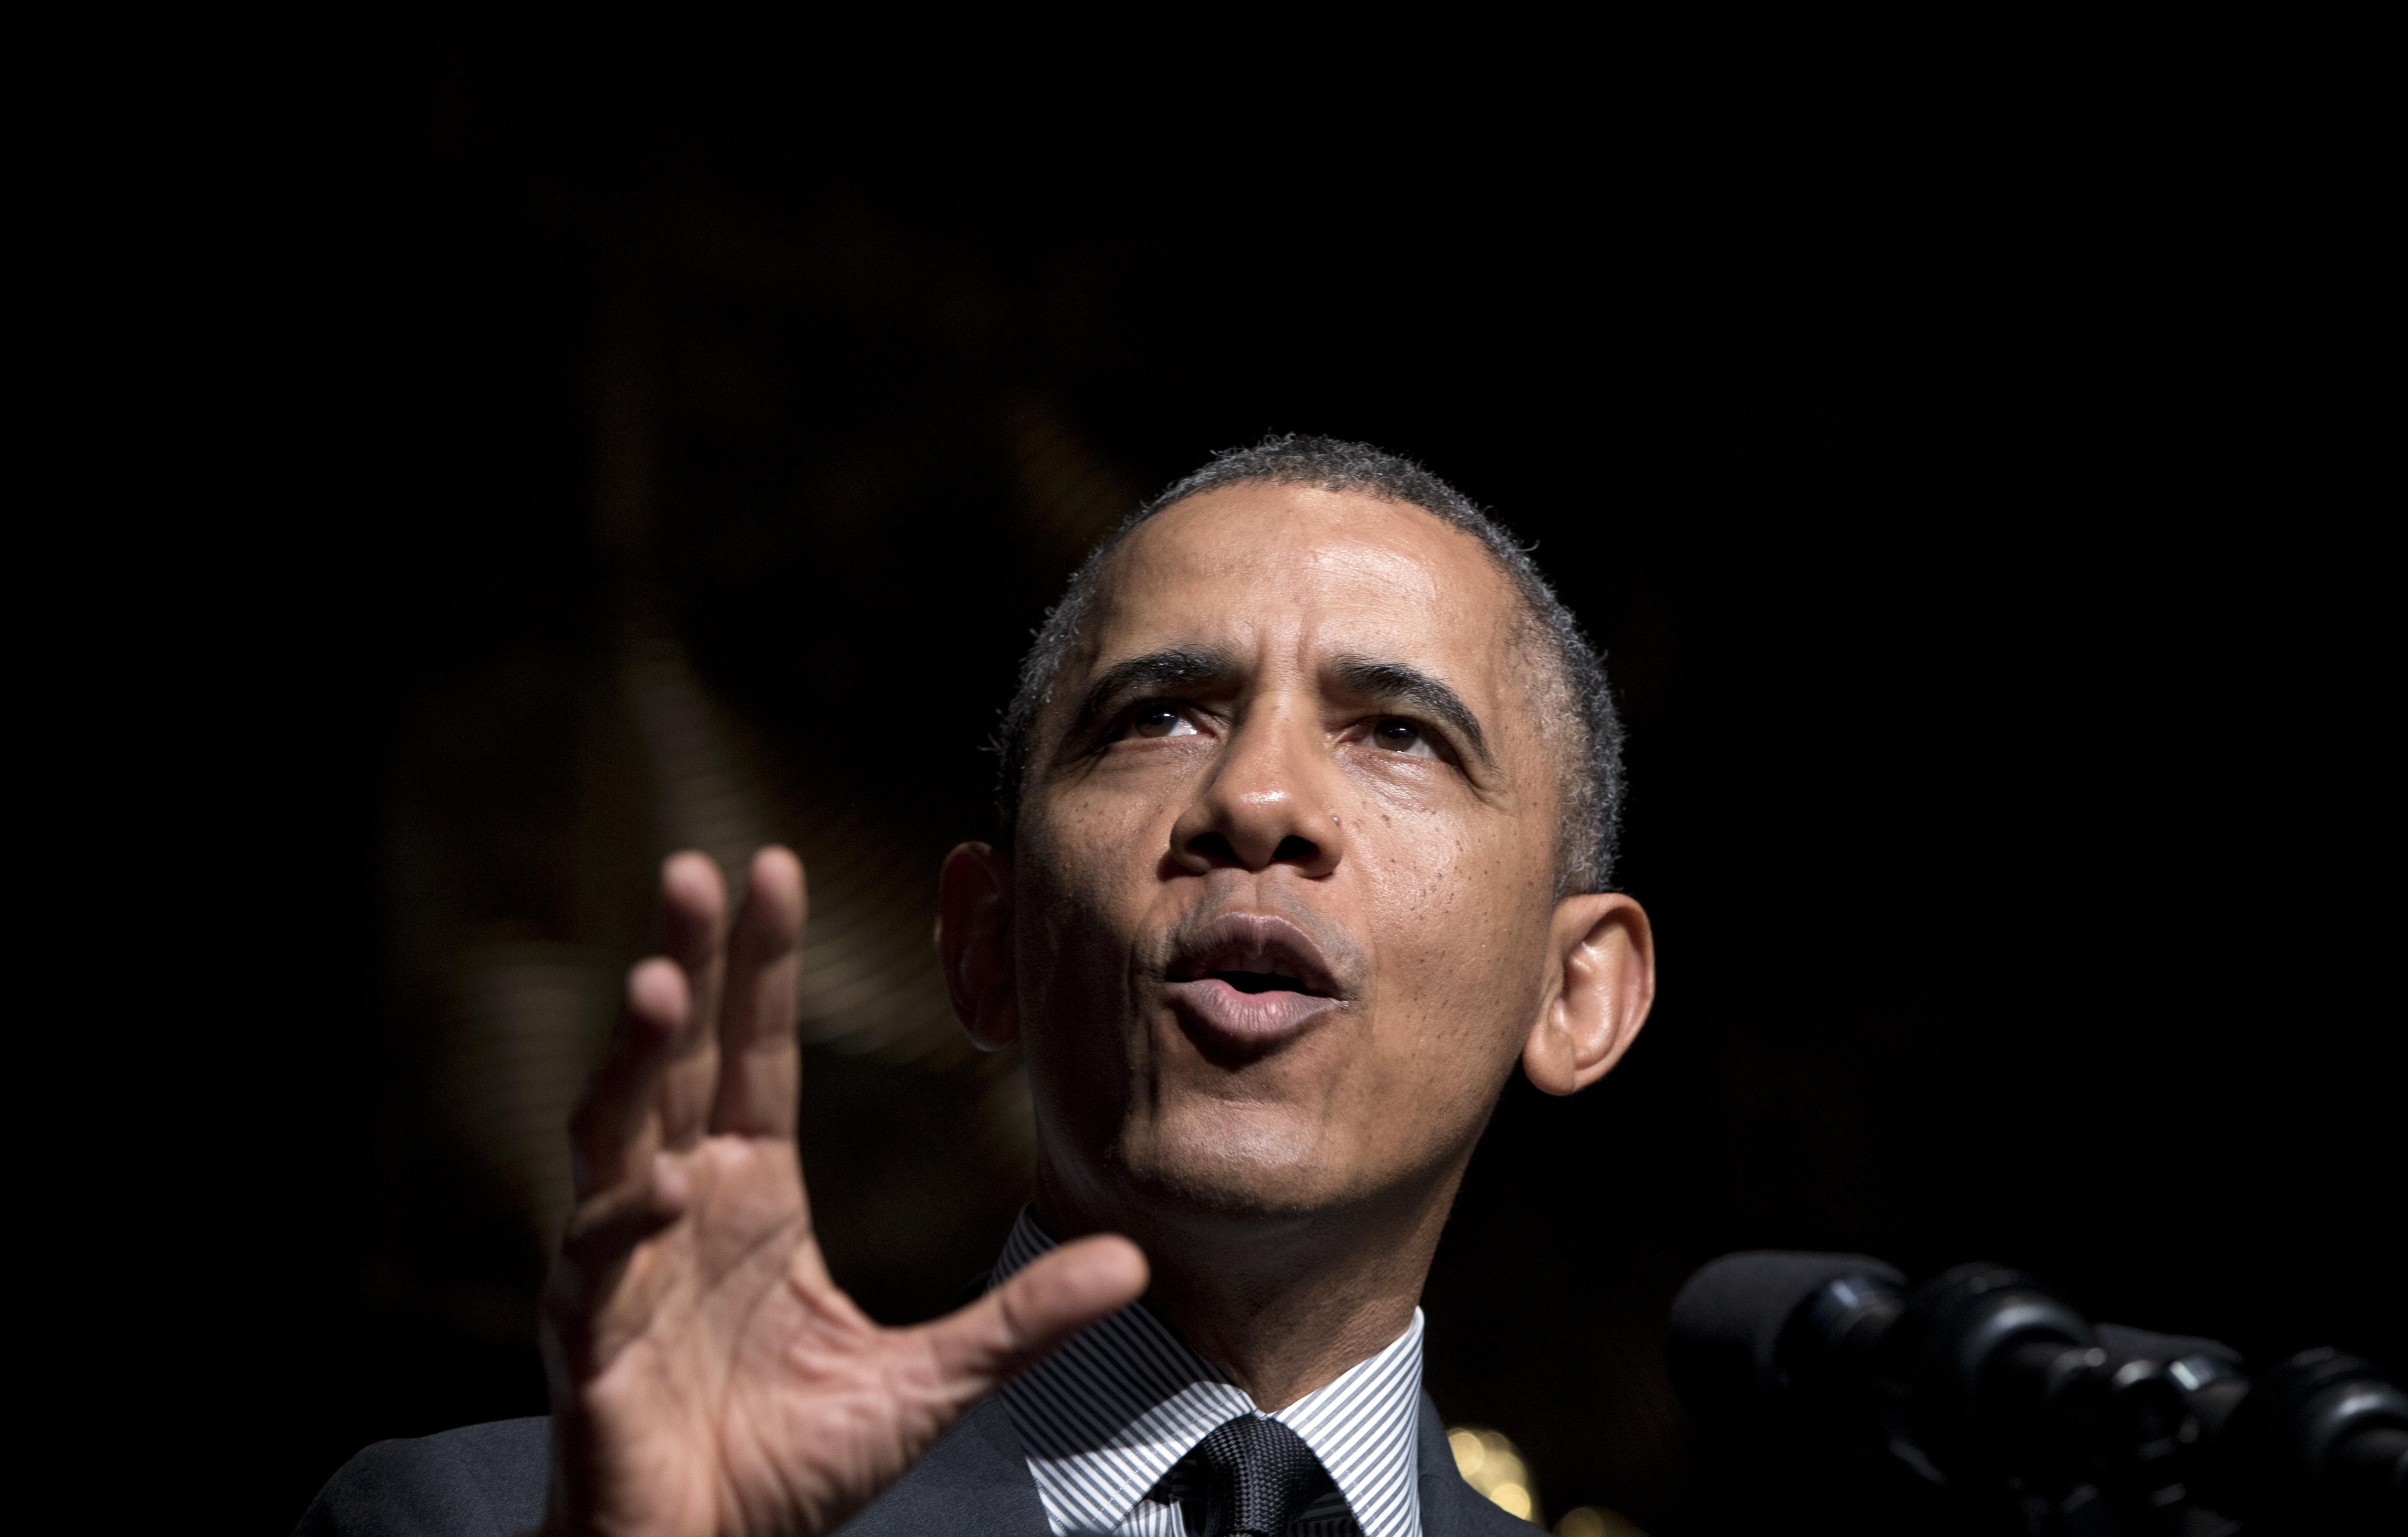 President Barack Obama gestures as he speaks at Rev. Al Sharpton's National Action Network's conference in New York, April 11, 2014